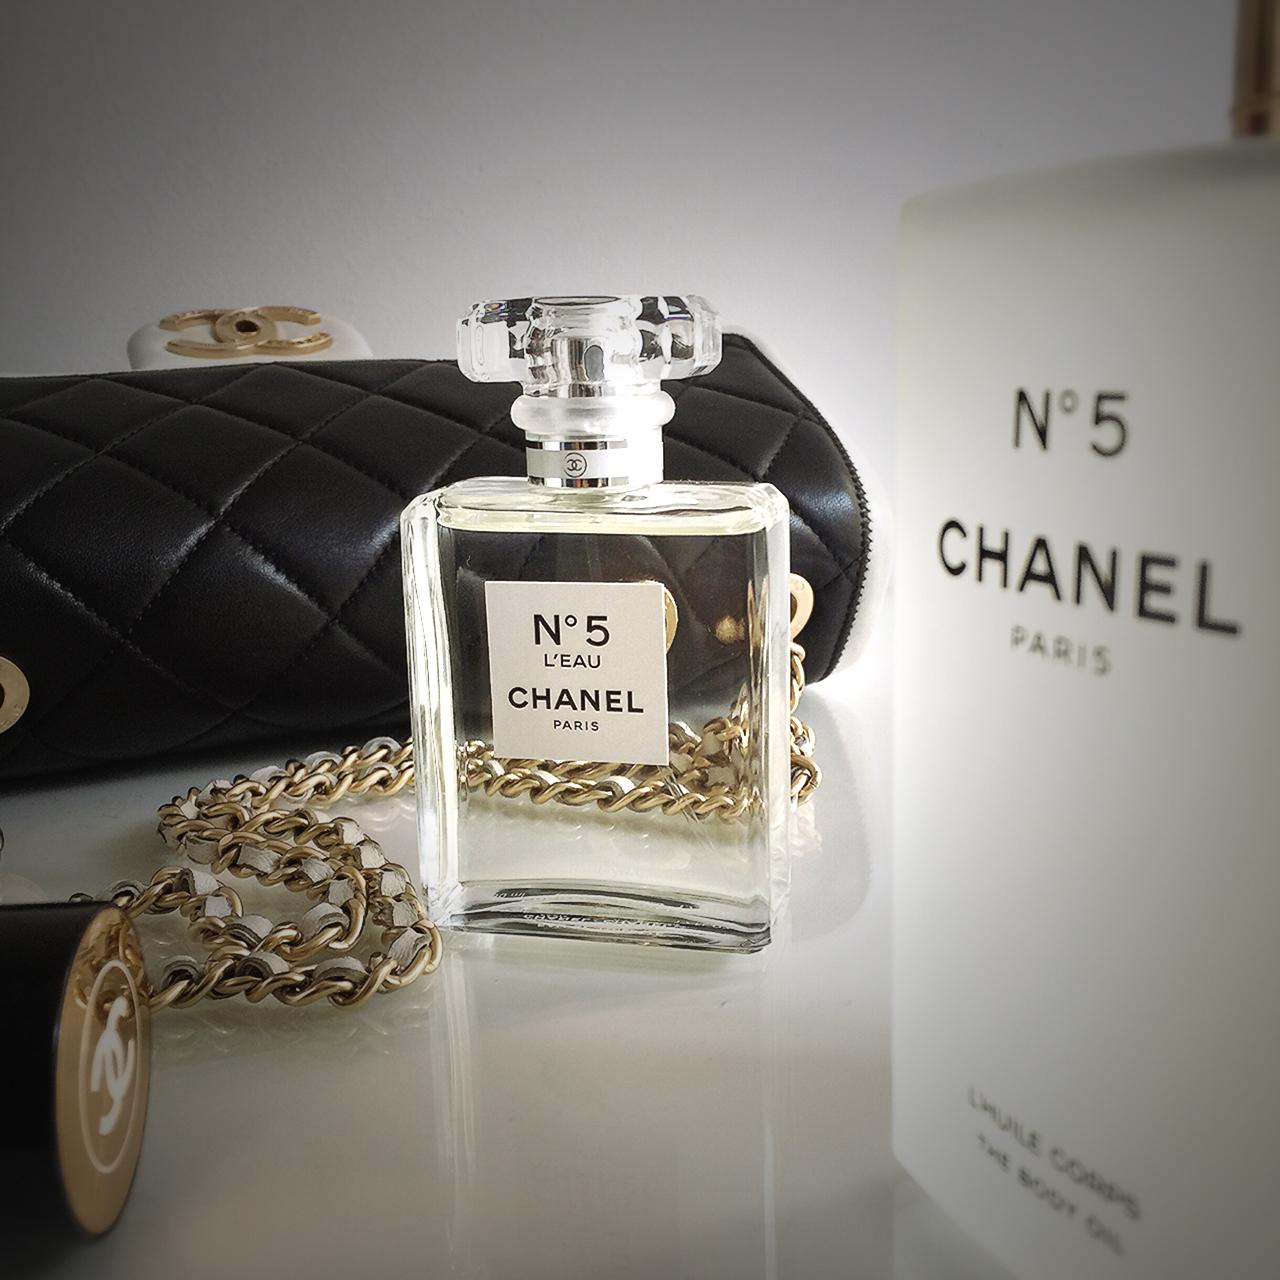 chanel n 5 l eau the body oil. Black Bedroom Furniture Sets. Home Design Ideas